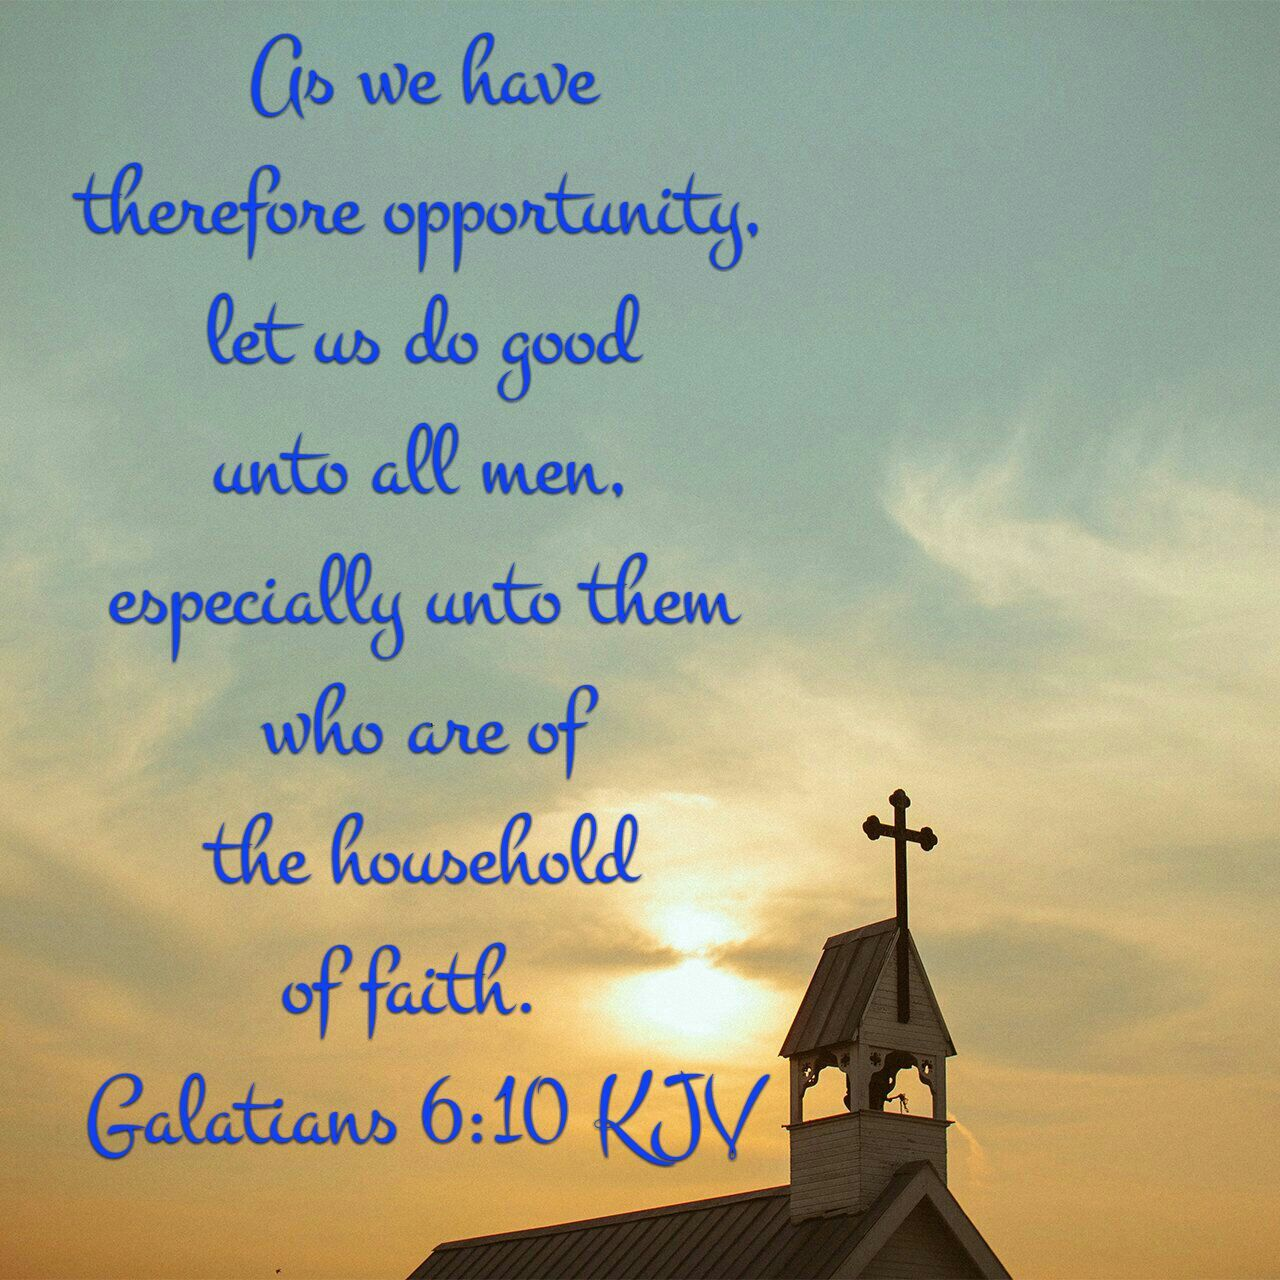 Galatians 6:10 KJV | Bible quotes kjv, You are the father, Kjv